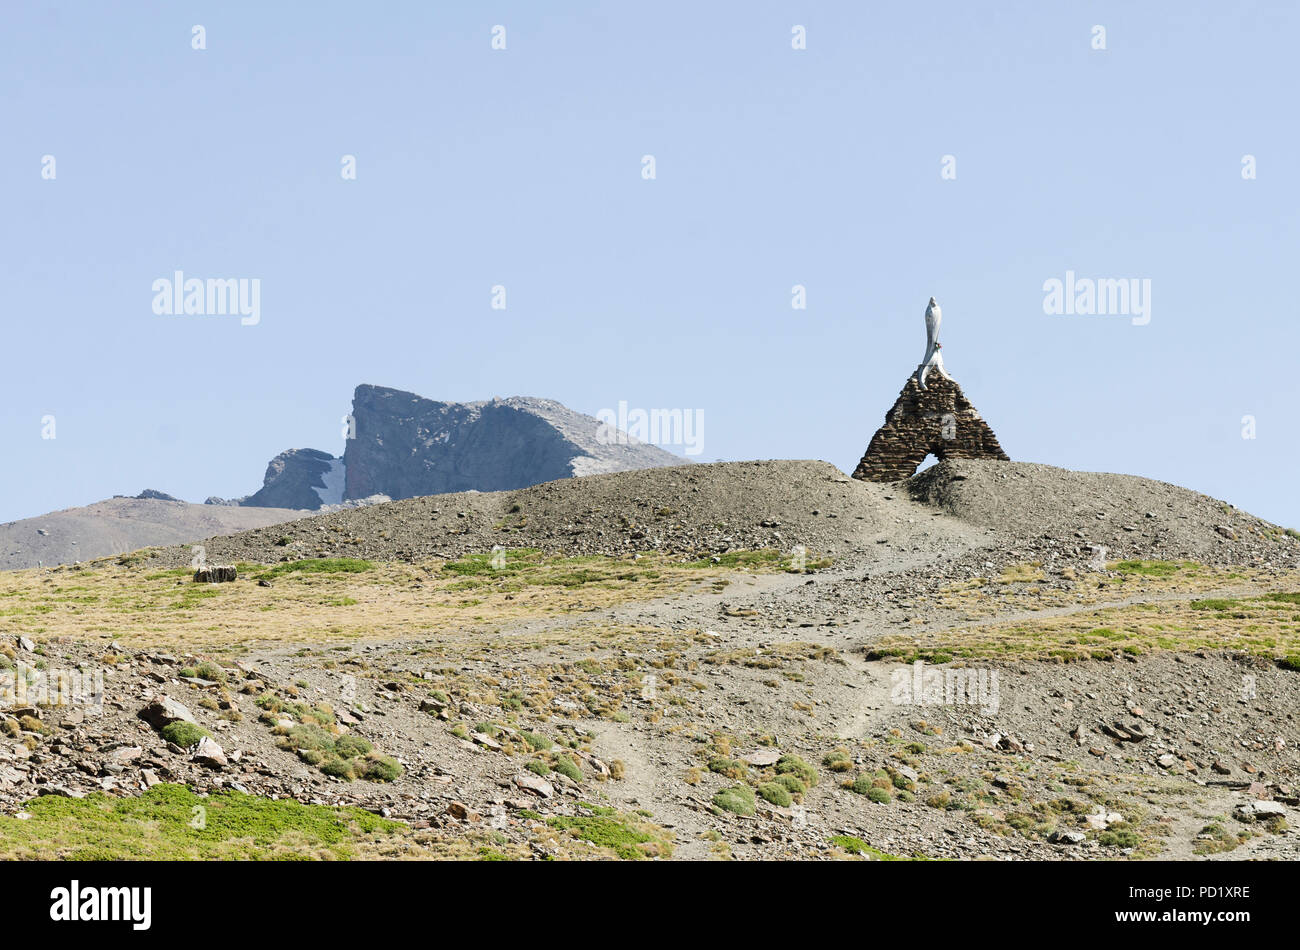 Our Lady of the Snows, Virgen de las Nieves, statue and Pico Veleta summit, Sierra Nevada, in summer season. Granada, Andalusia, Spain. - Stock Image